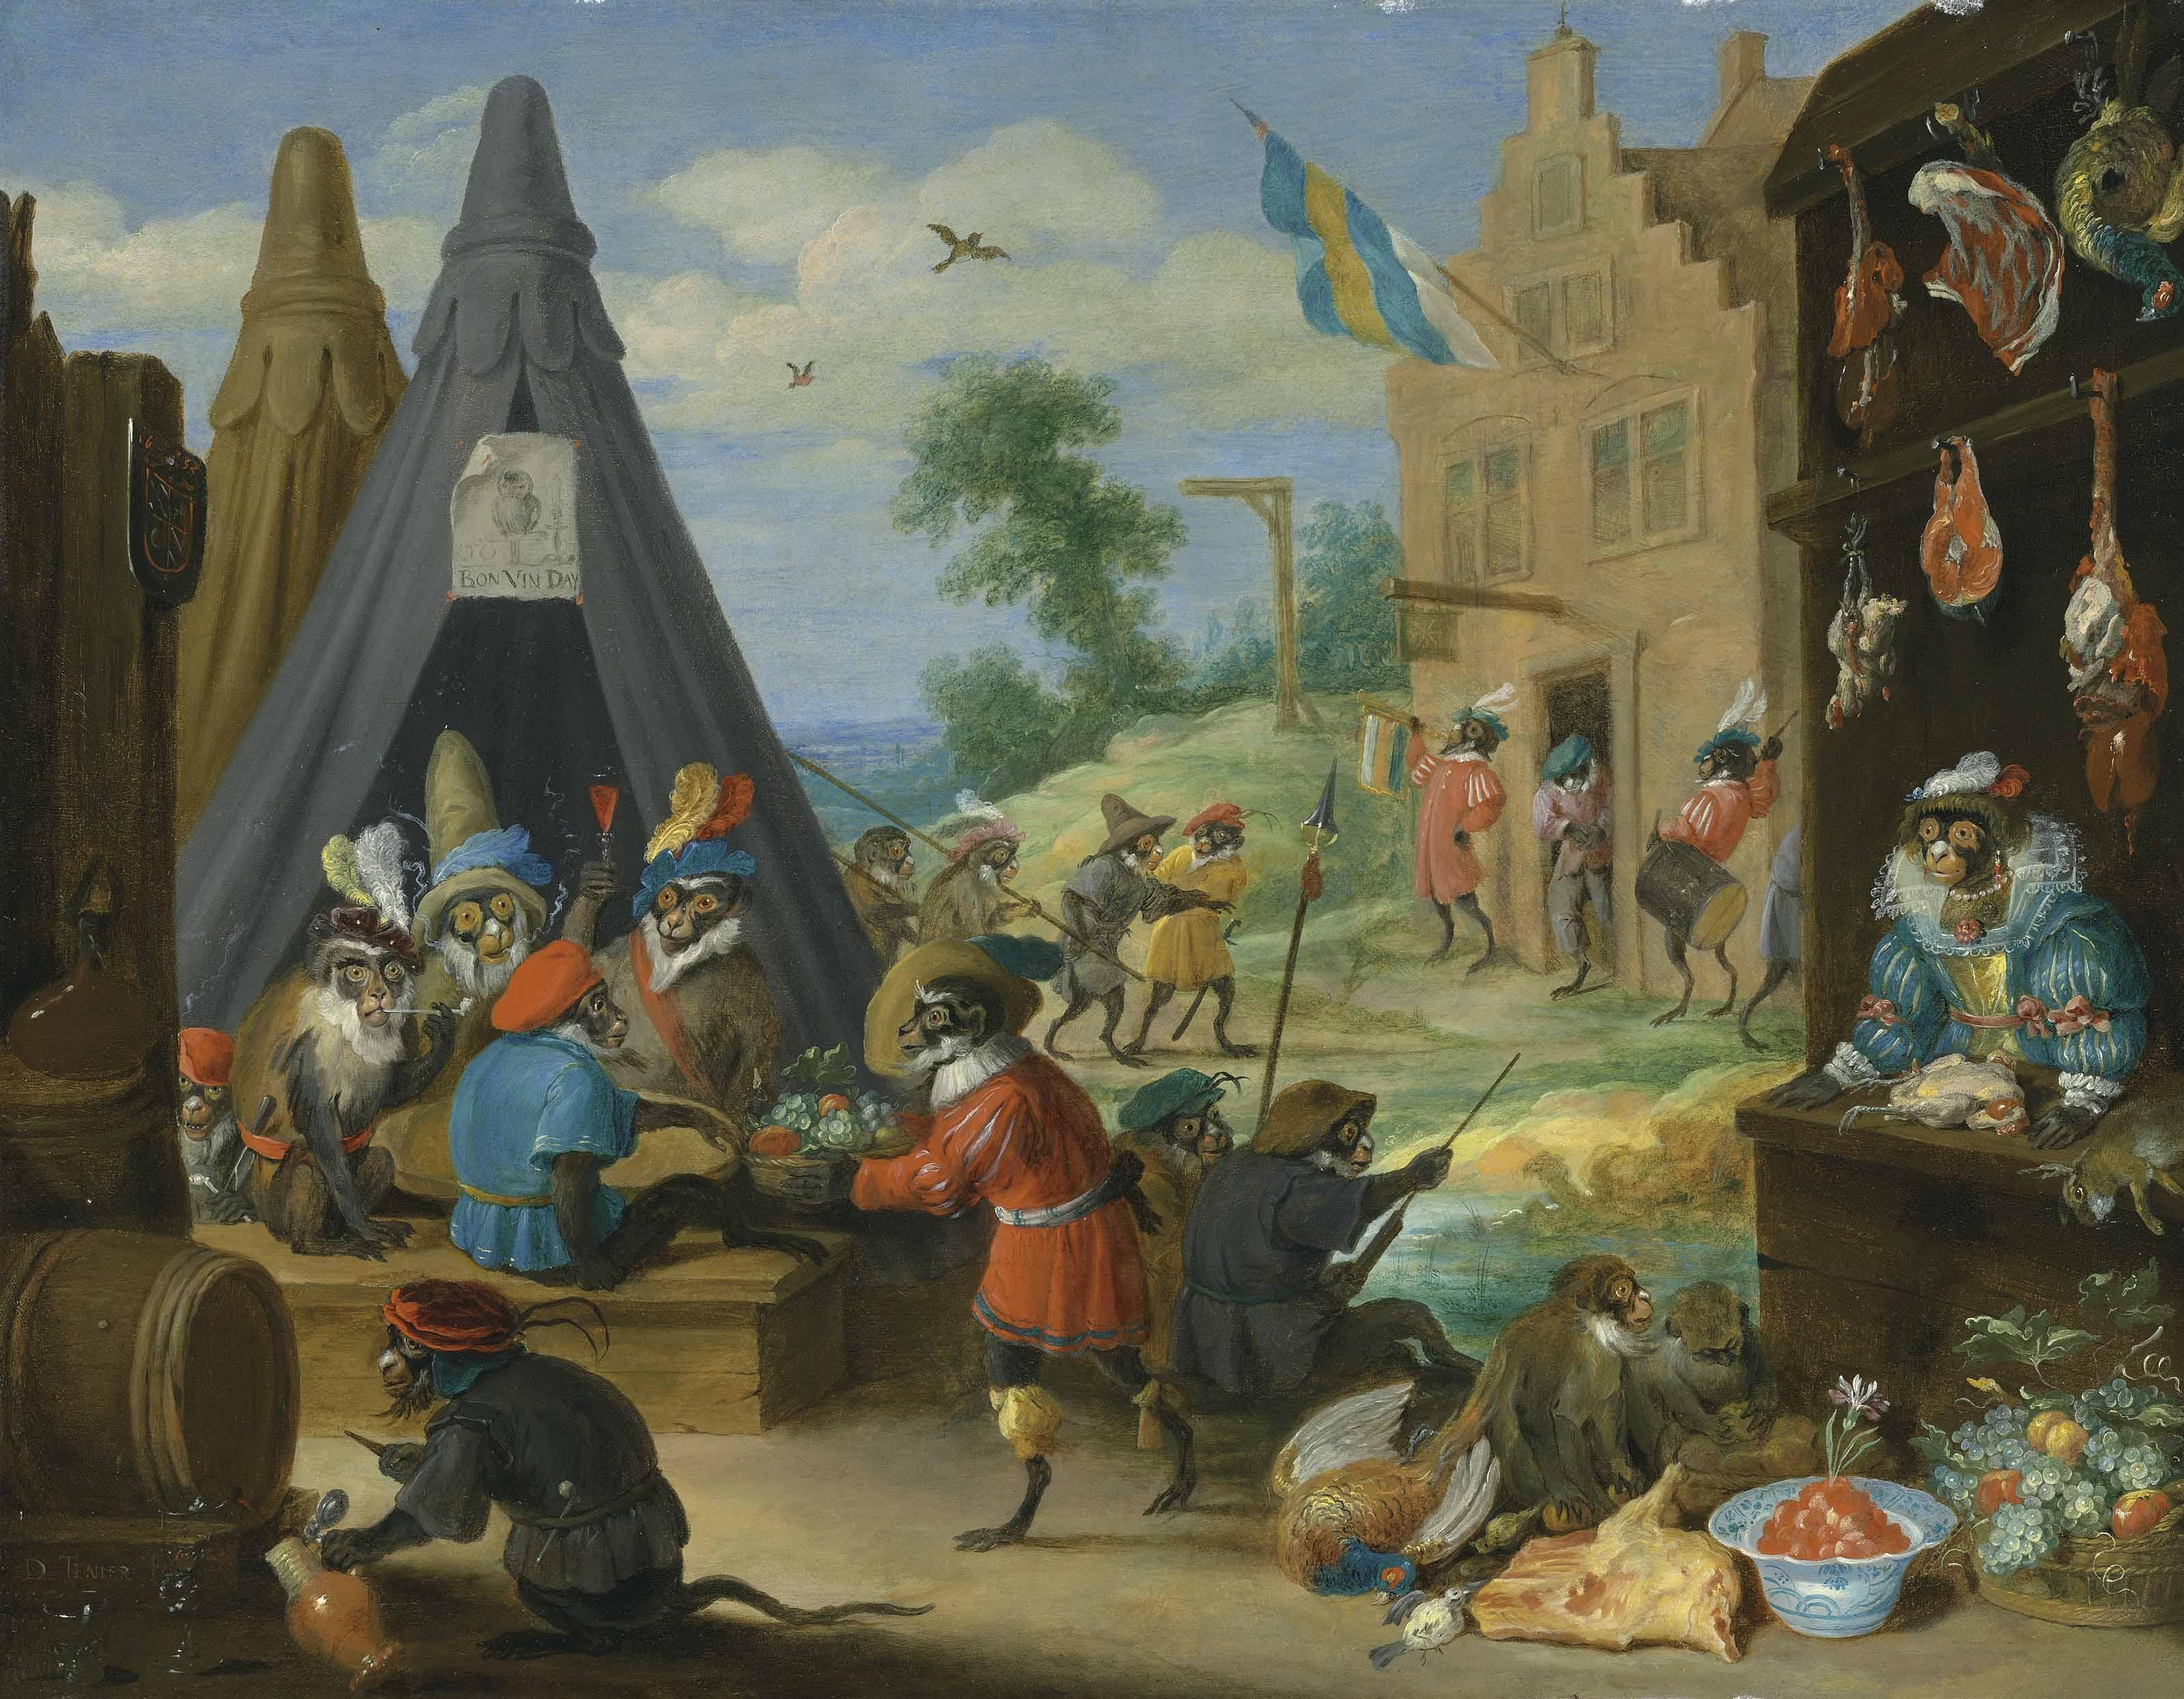 A festival of monkeys